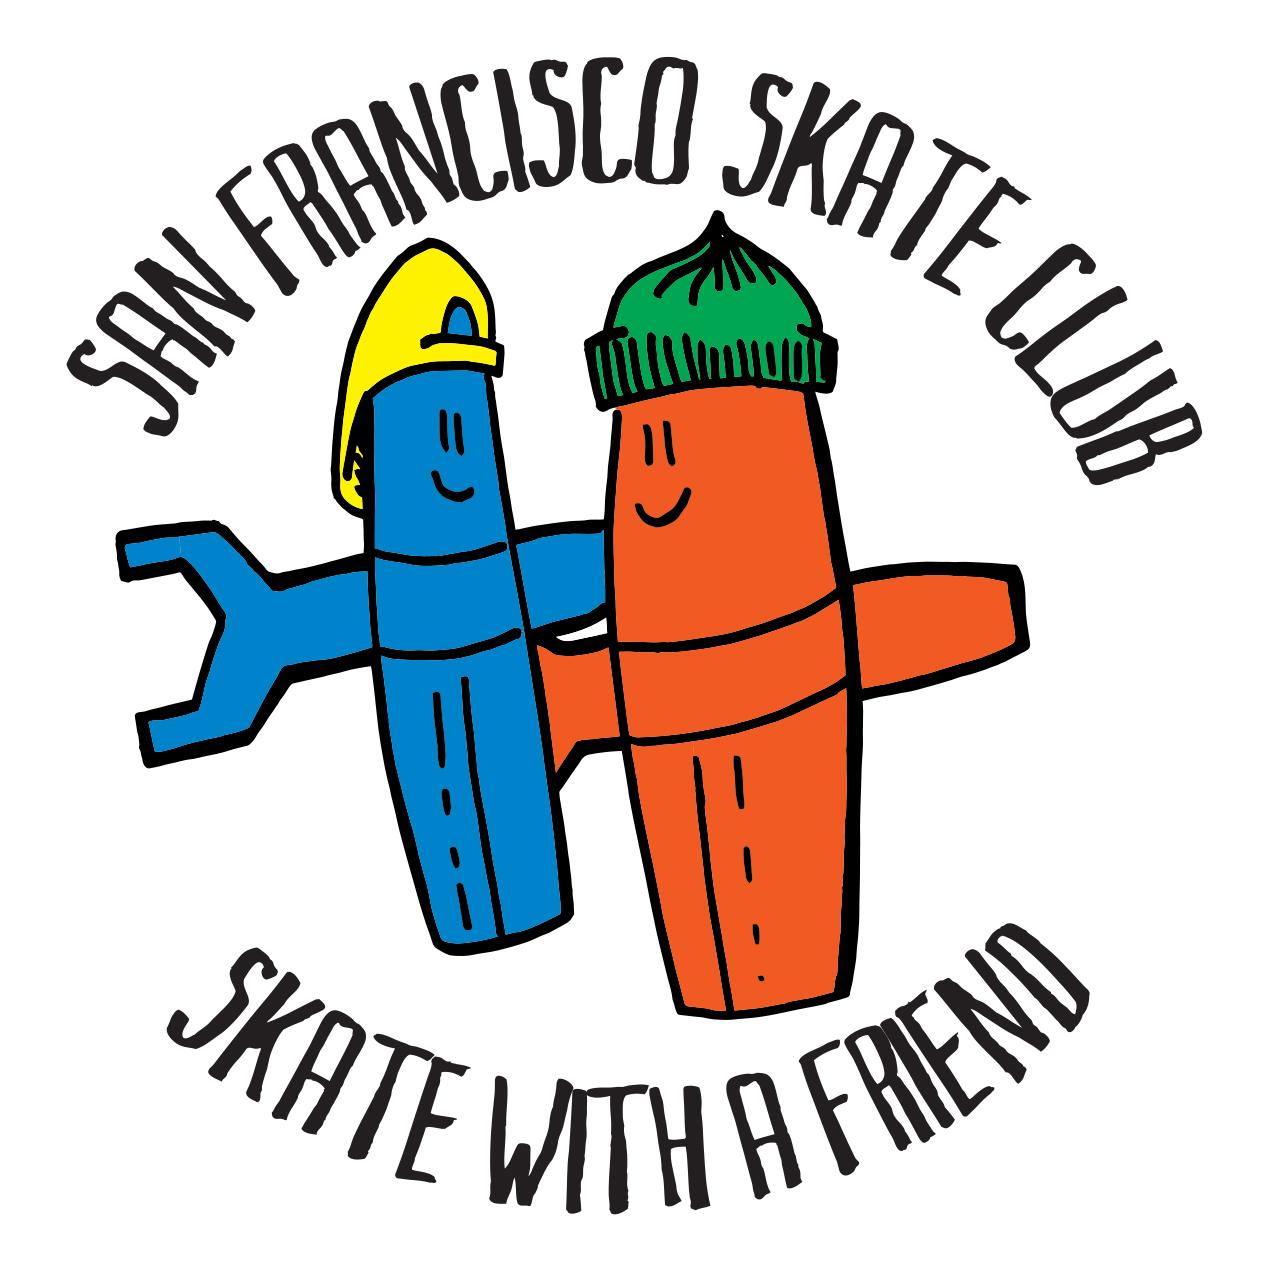 San Francisco Skate Club Skate Camps and Classes